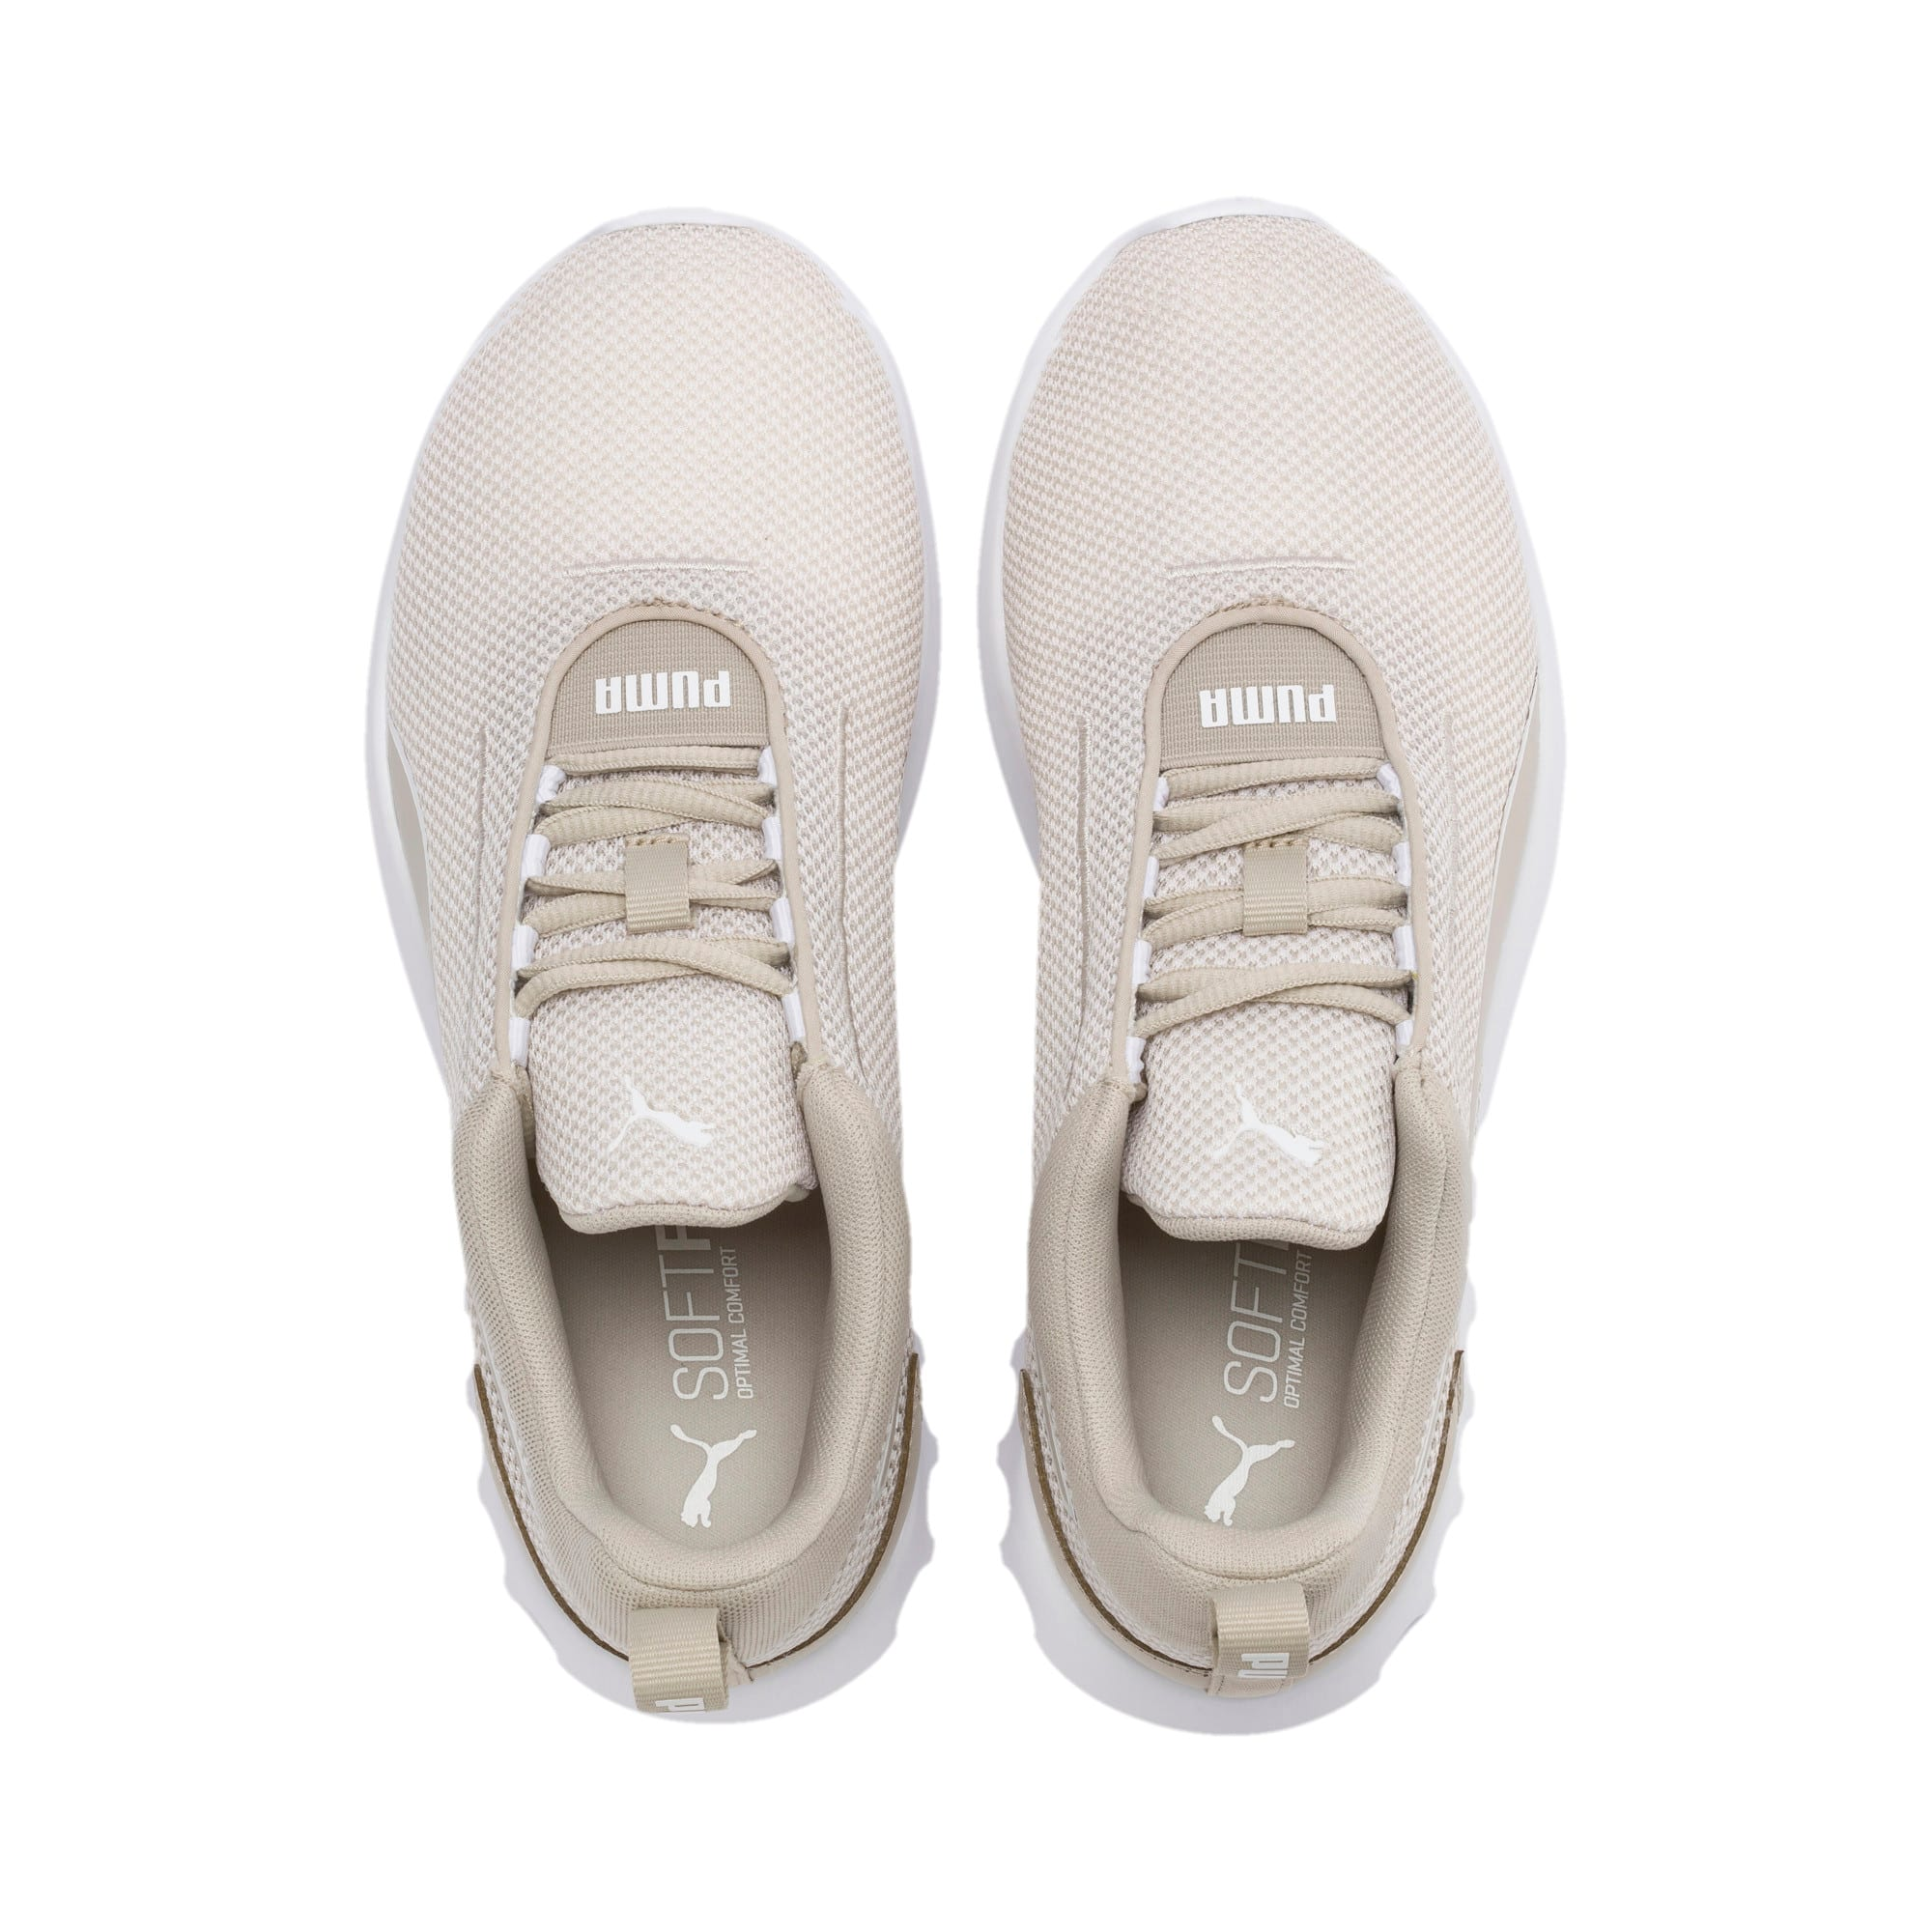 Thumbnail 6 of Carson 2 Concave Women's Training Shoes, Silver Gray-Puma White, medium